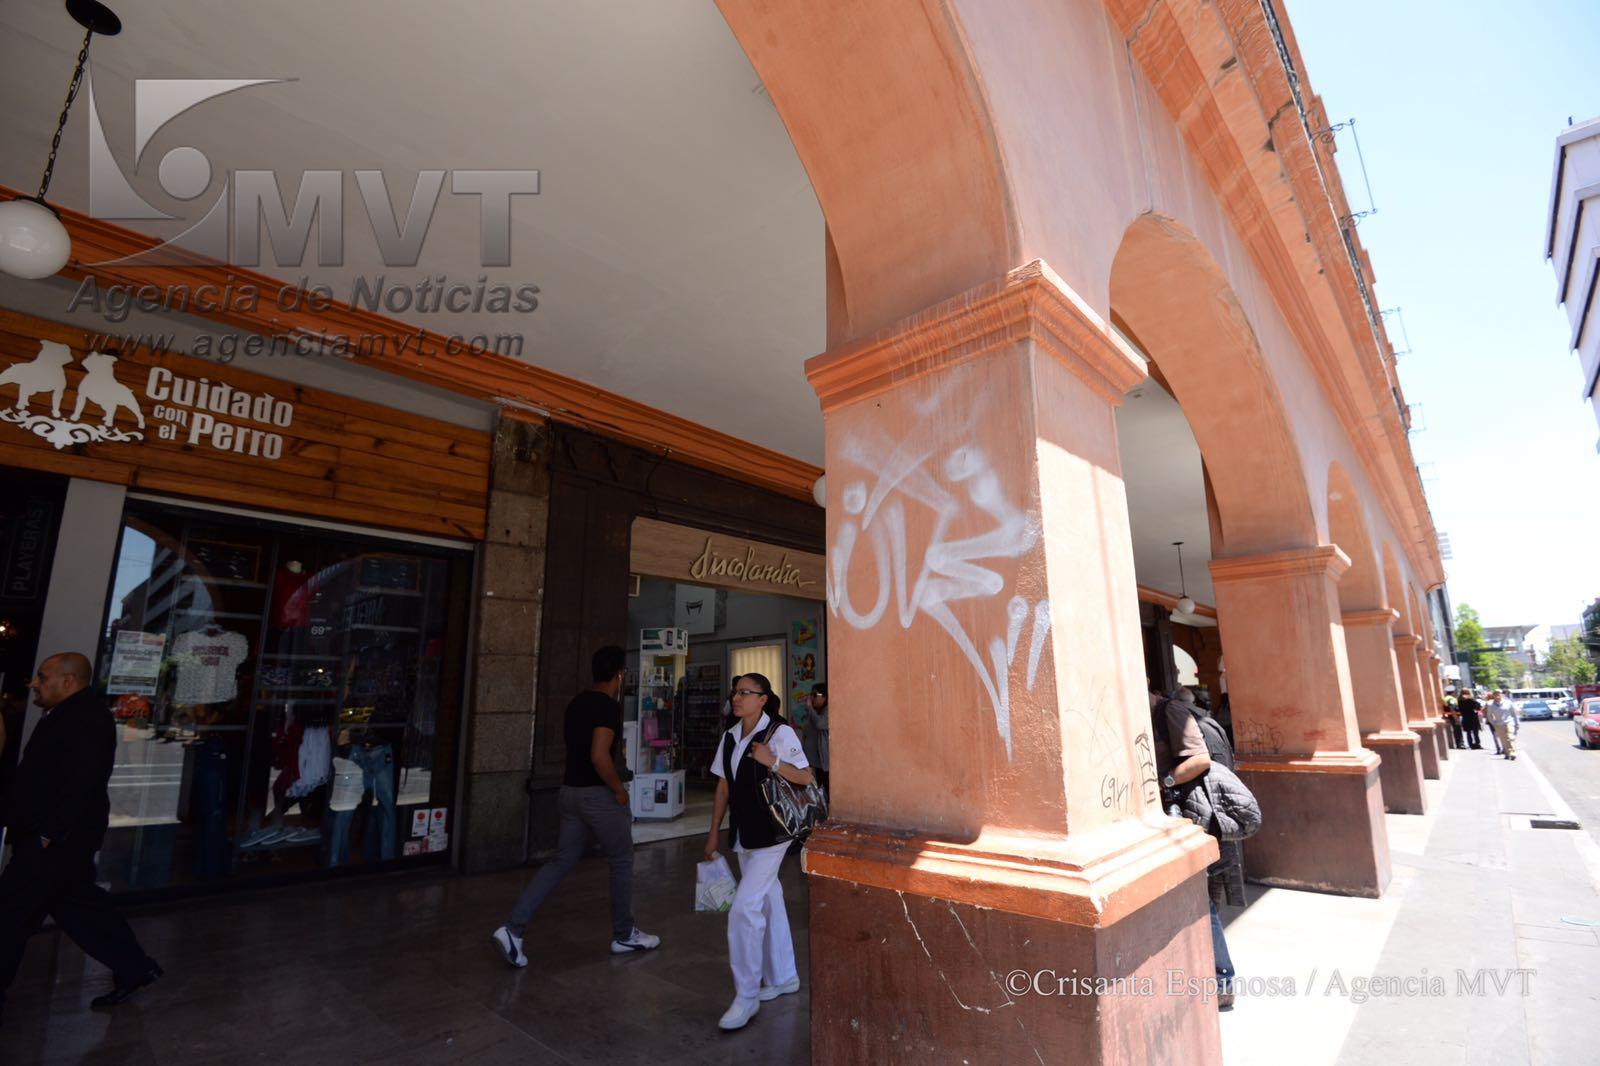 FOTO: Agencia MVT / Crisanta Espinosa